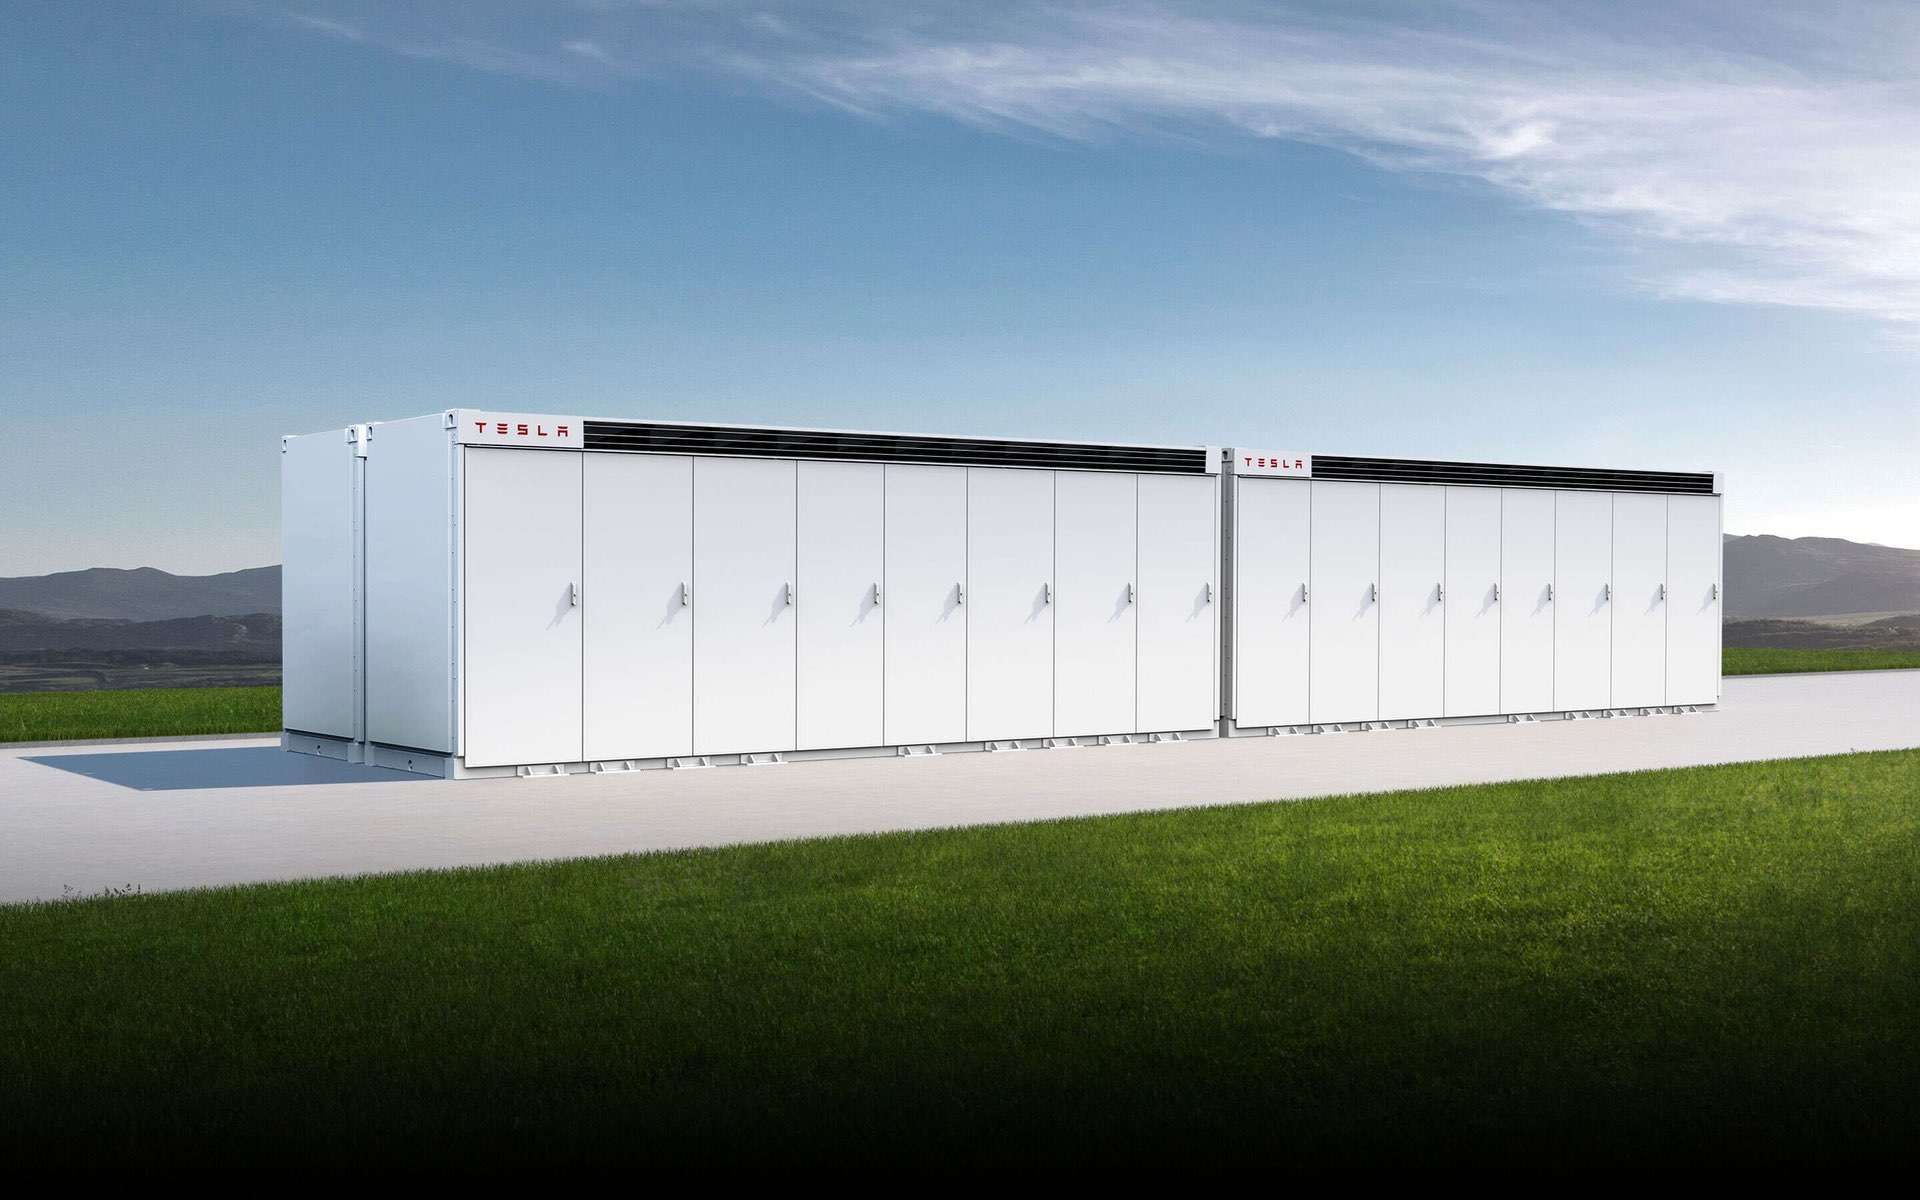 Tesla_Megafactory-0002